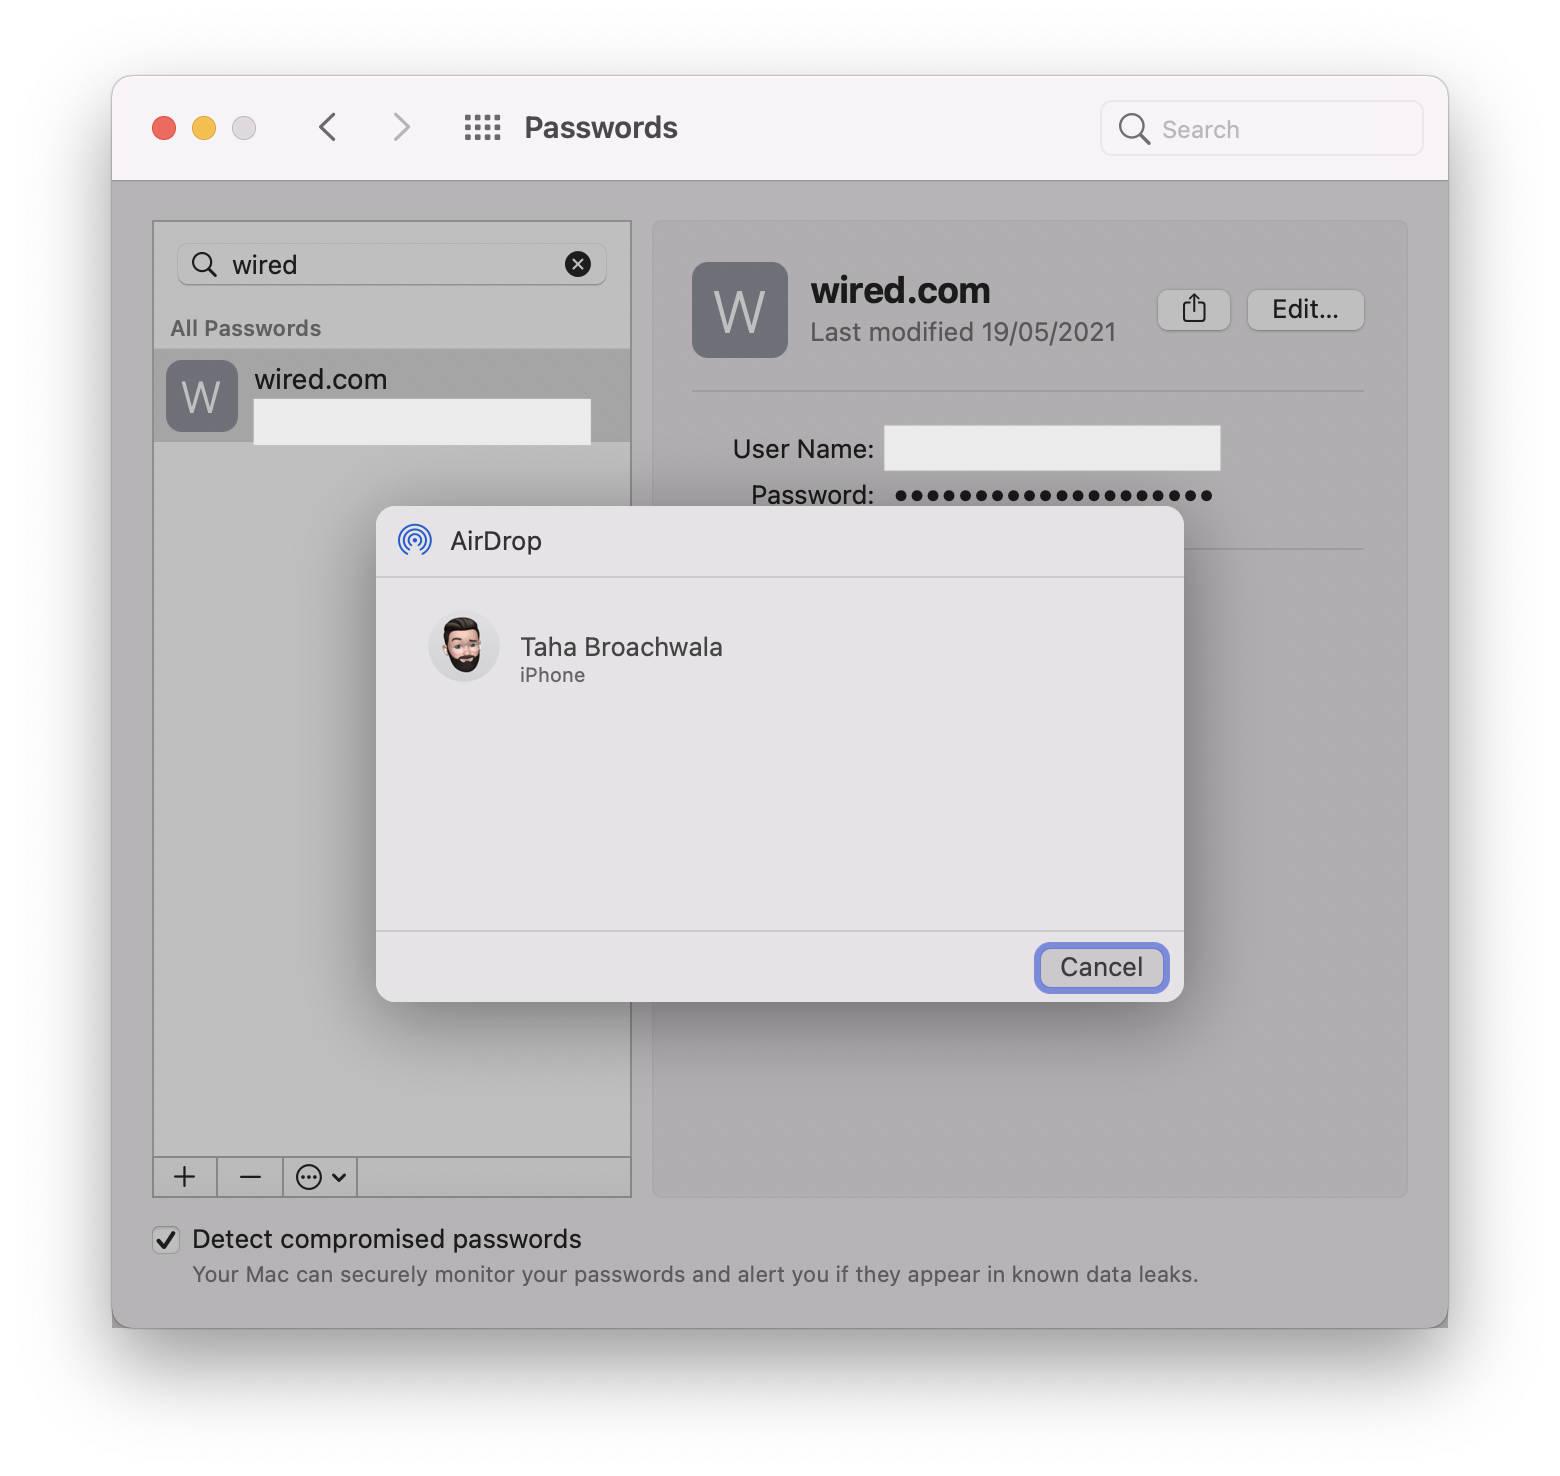 Sharing a password via AirDrop on Mac running macOS Monterey.